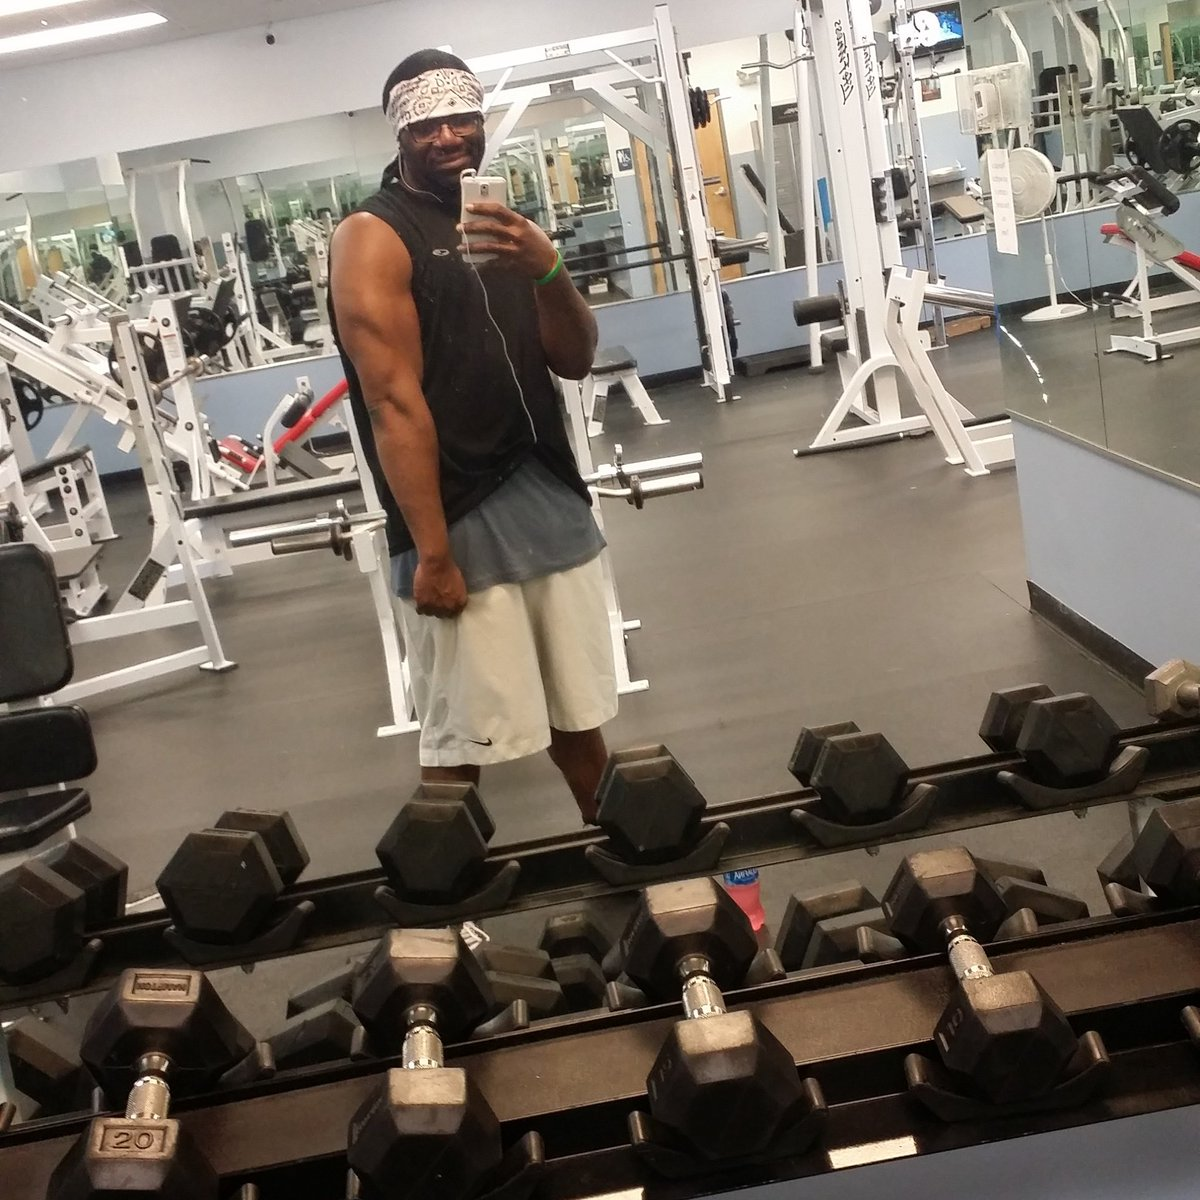 Solid workout tonight #fitfam #gymlifestyle #Gohardeveryday #liftingheavyshit #youcanchangetoo #NewYearSameMe #bodybuilder #marathon pic.twitter.com/idvsoO4iM4